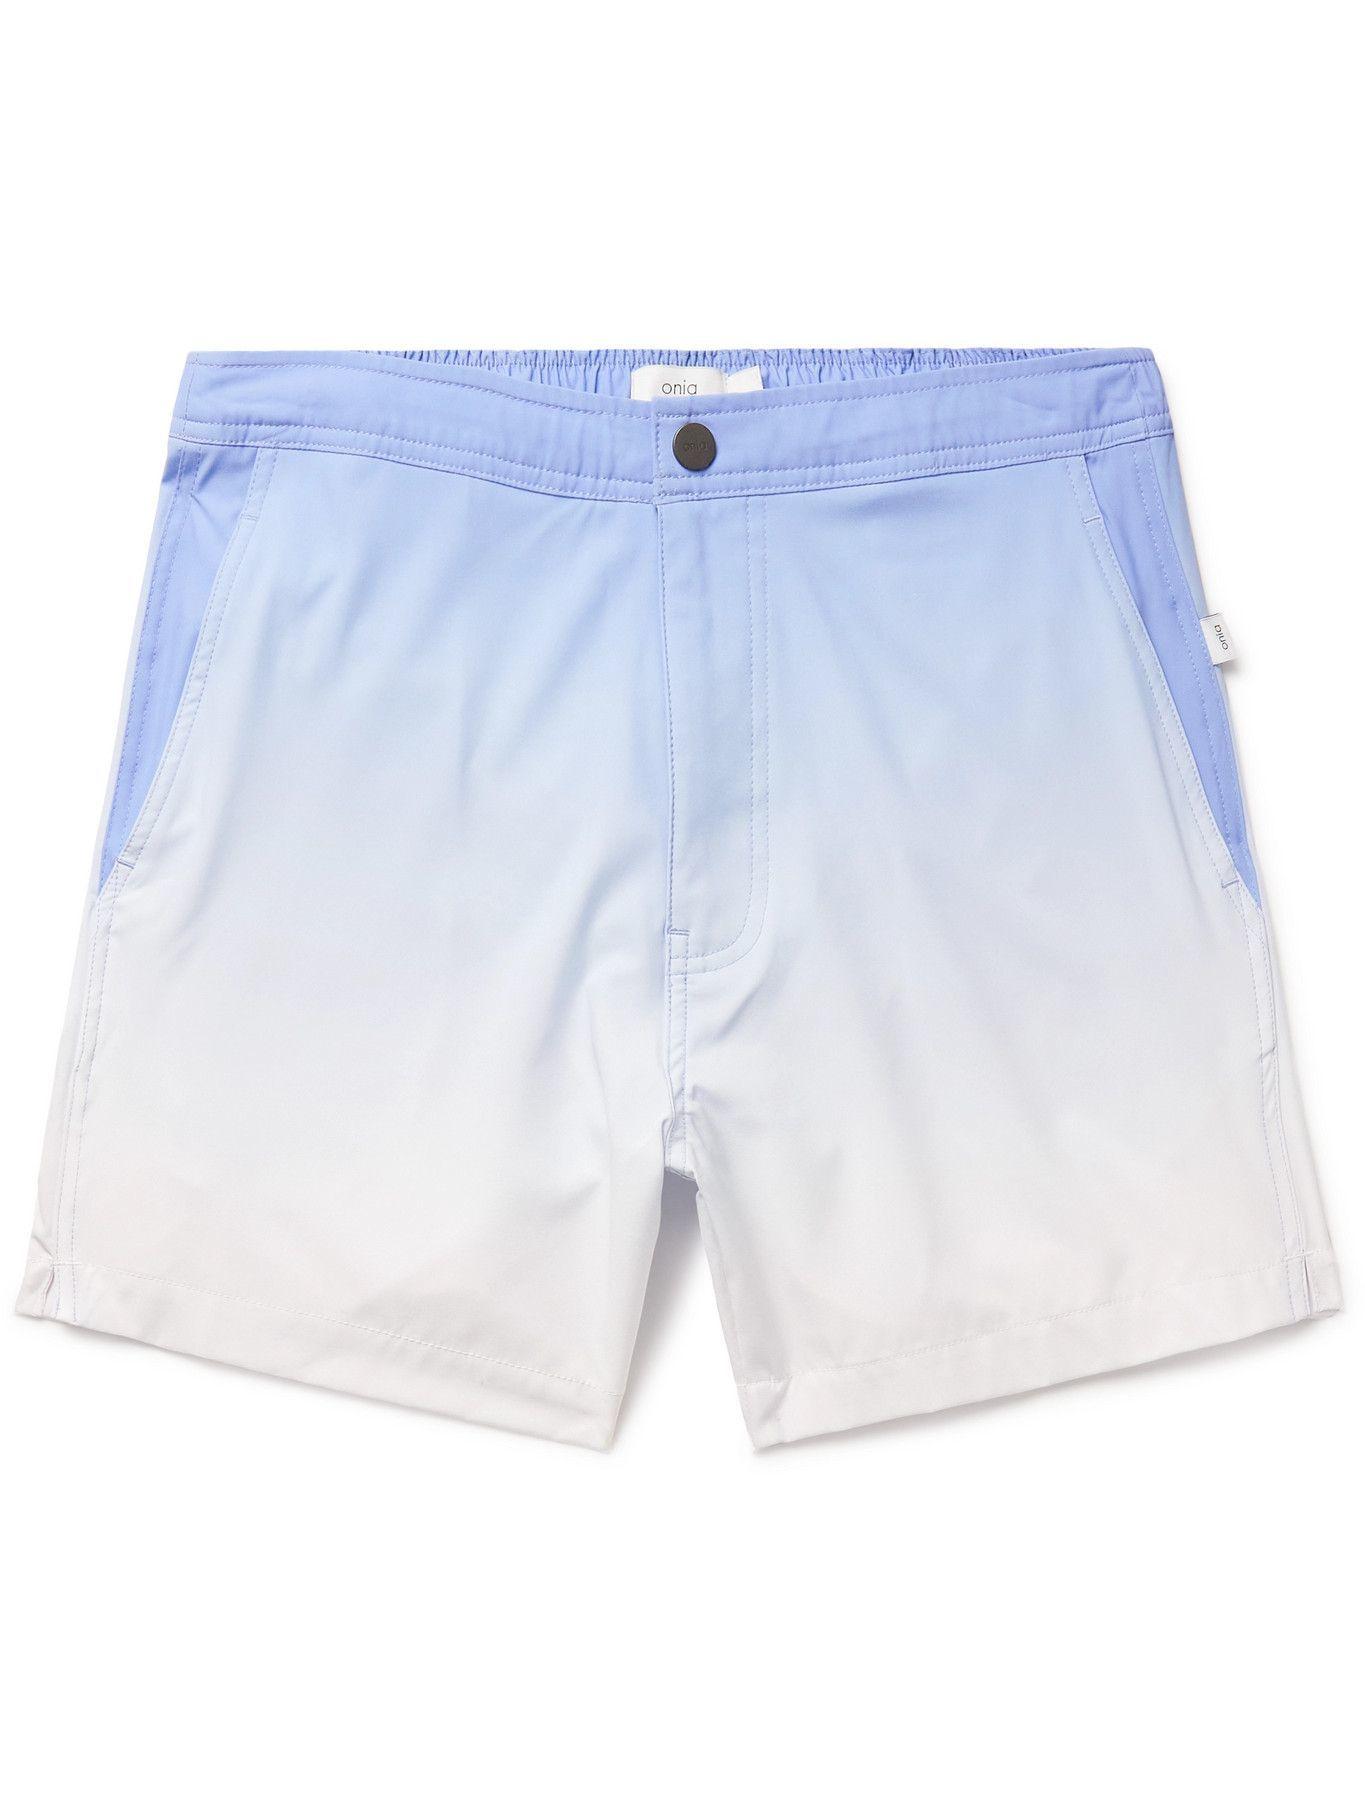 Photo: Onia - Calder Mid-Length Ombré Swim Shorts - Blue